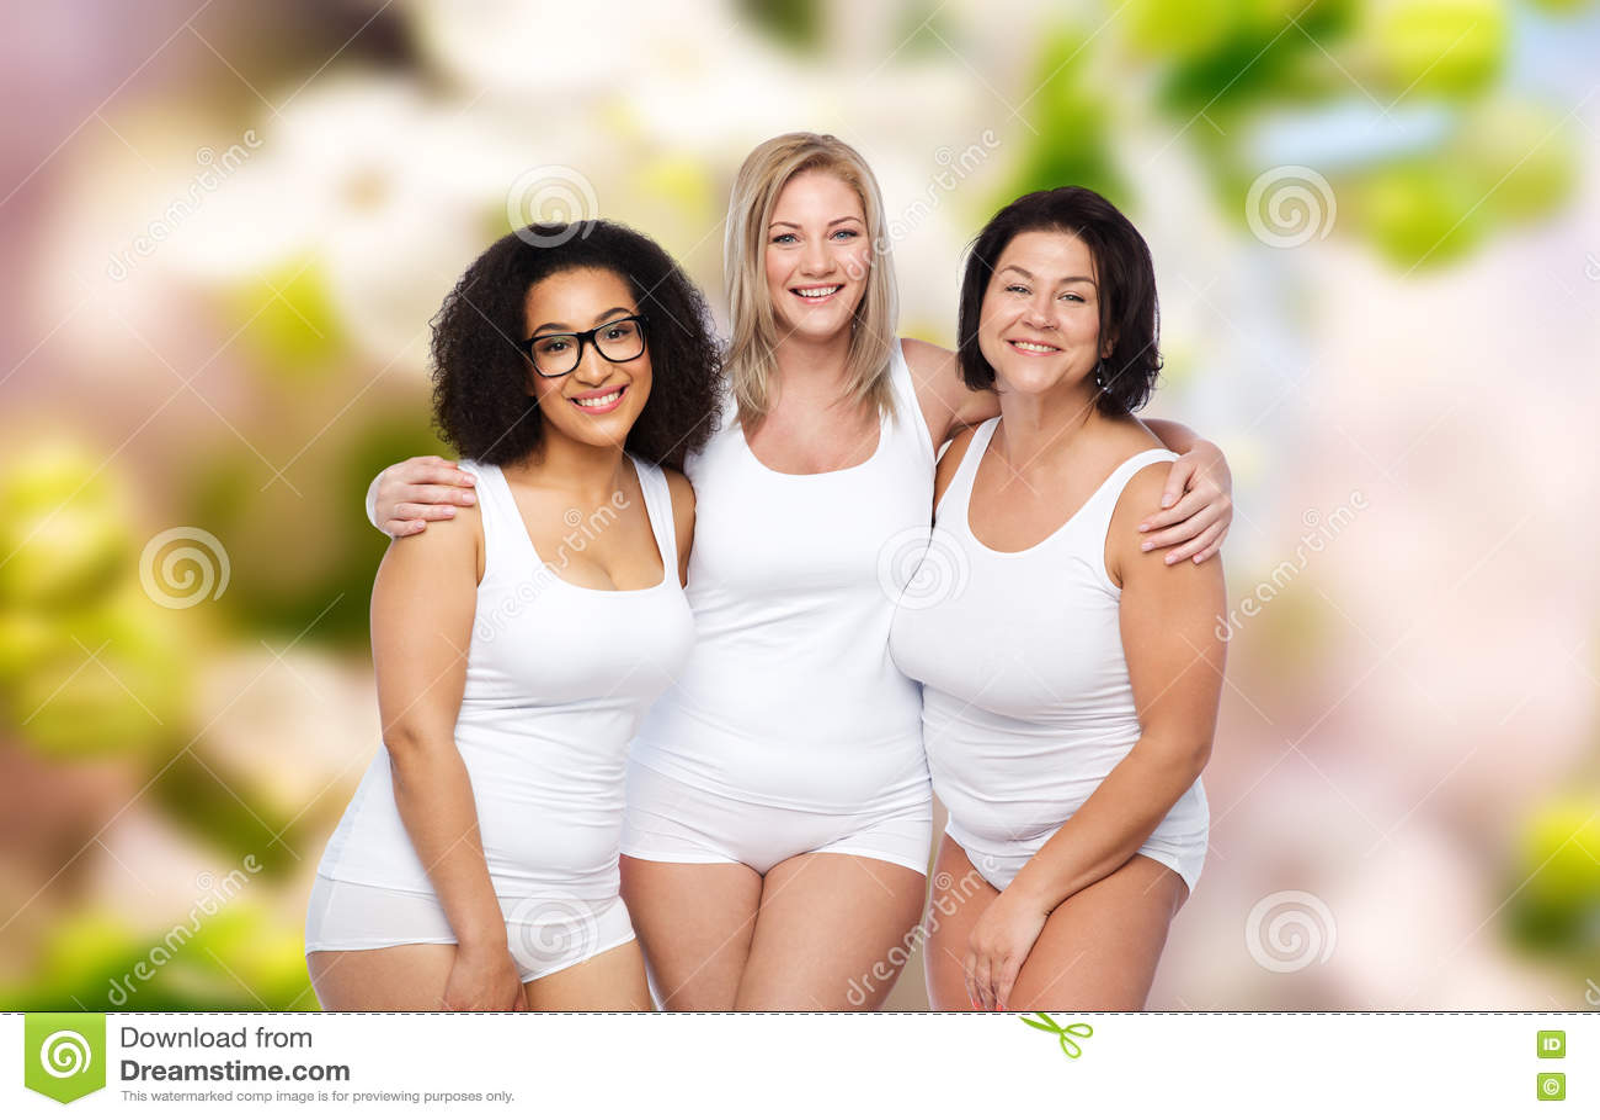 68bd58e724c Group Of Happy Plus Size Women In White Underwear Stock Photo ...